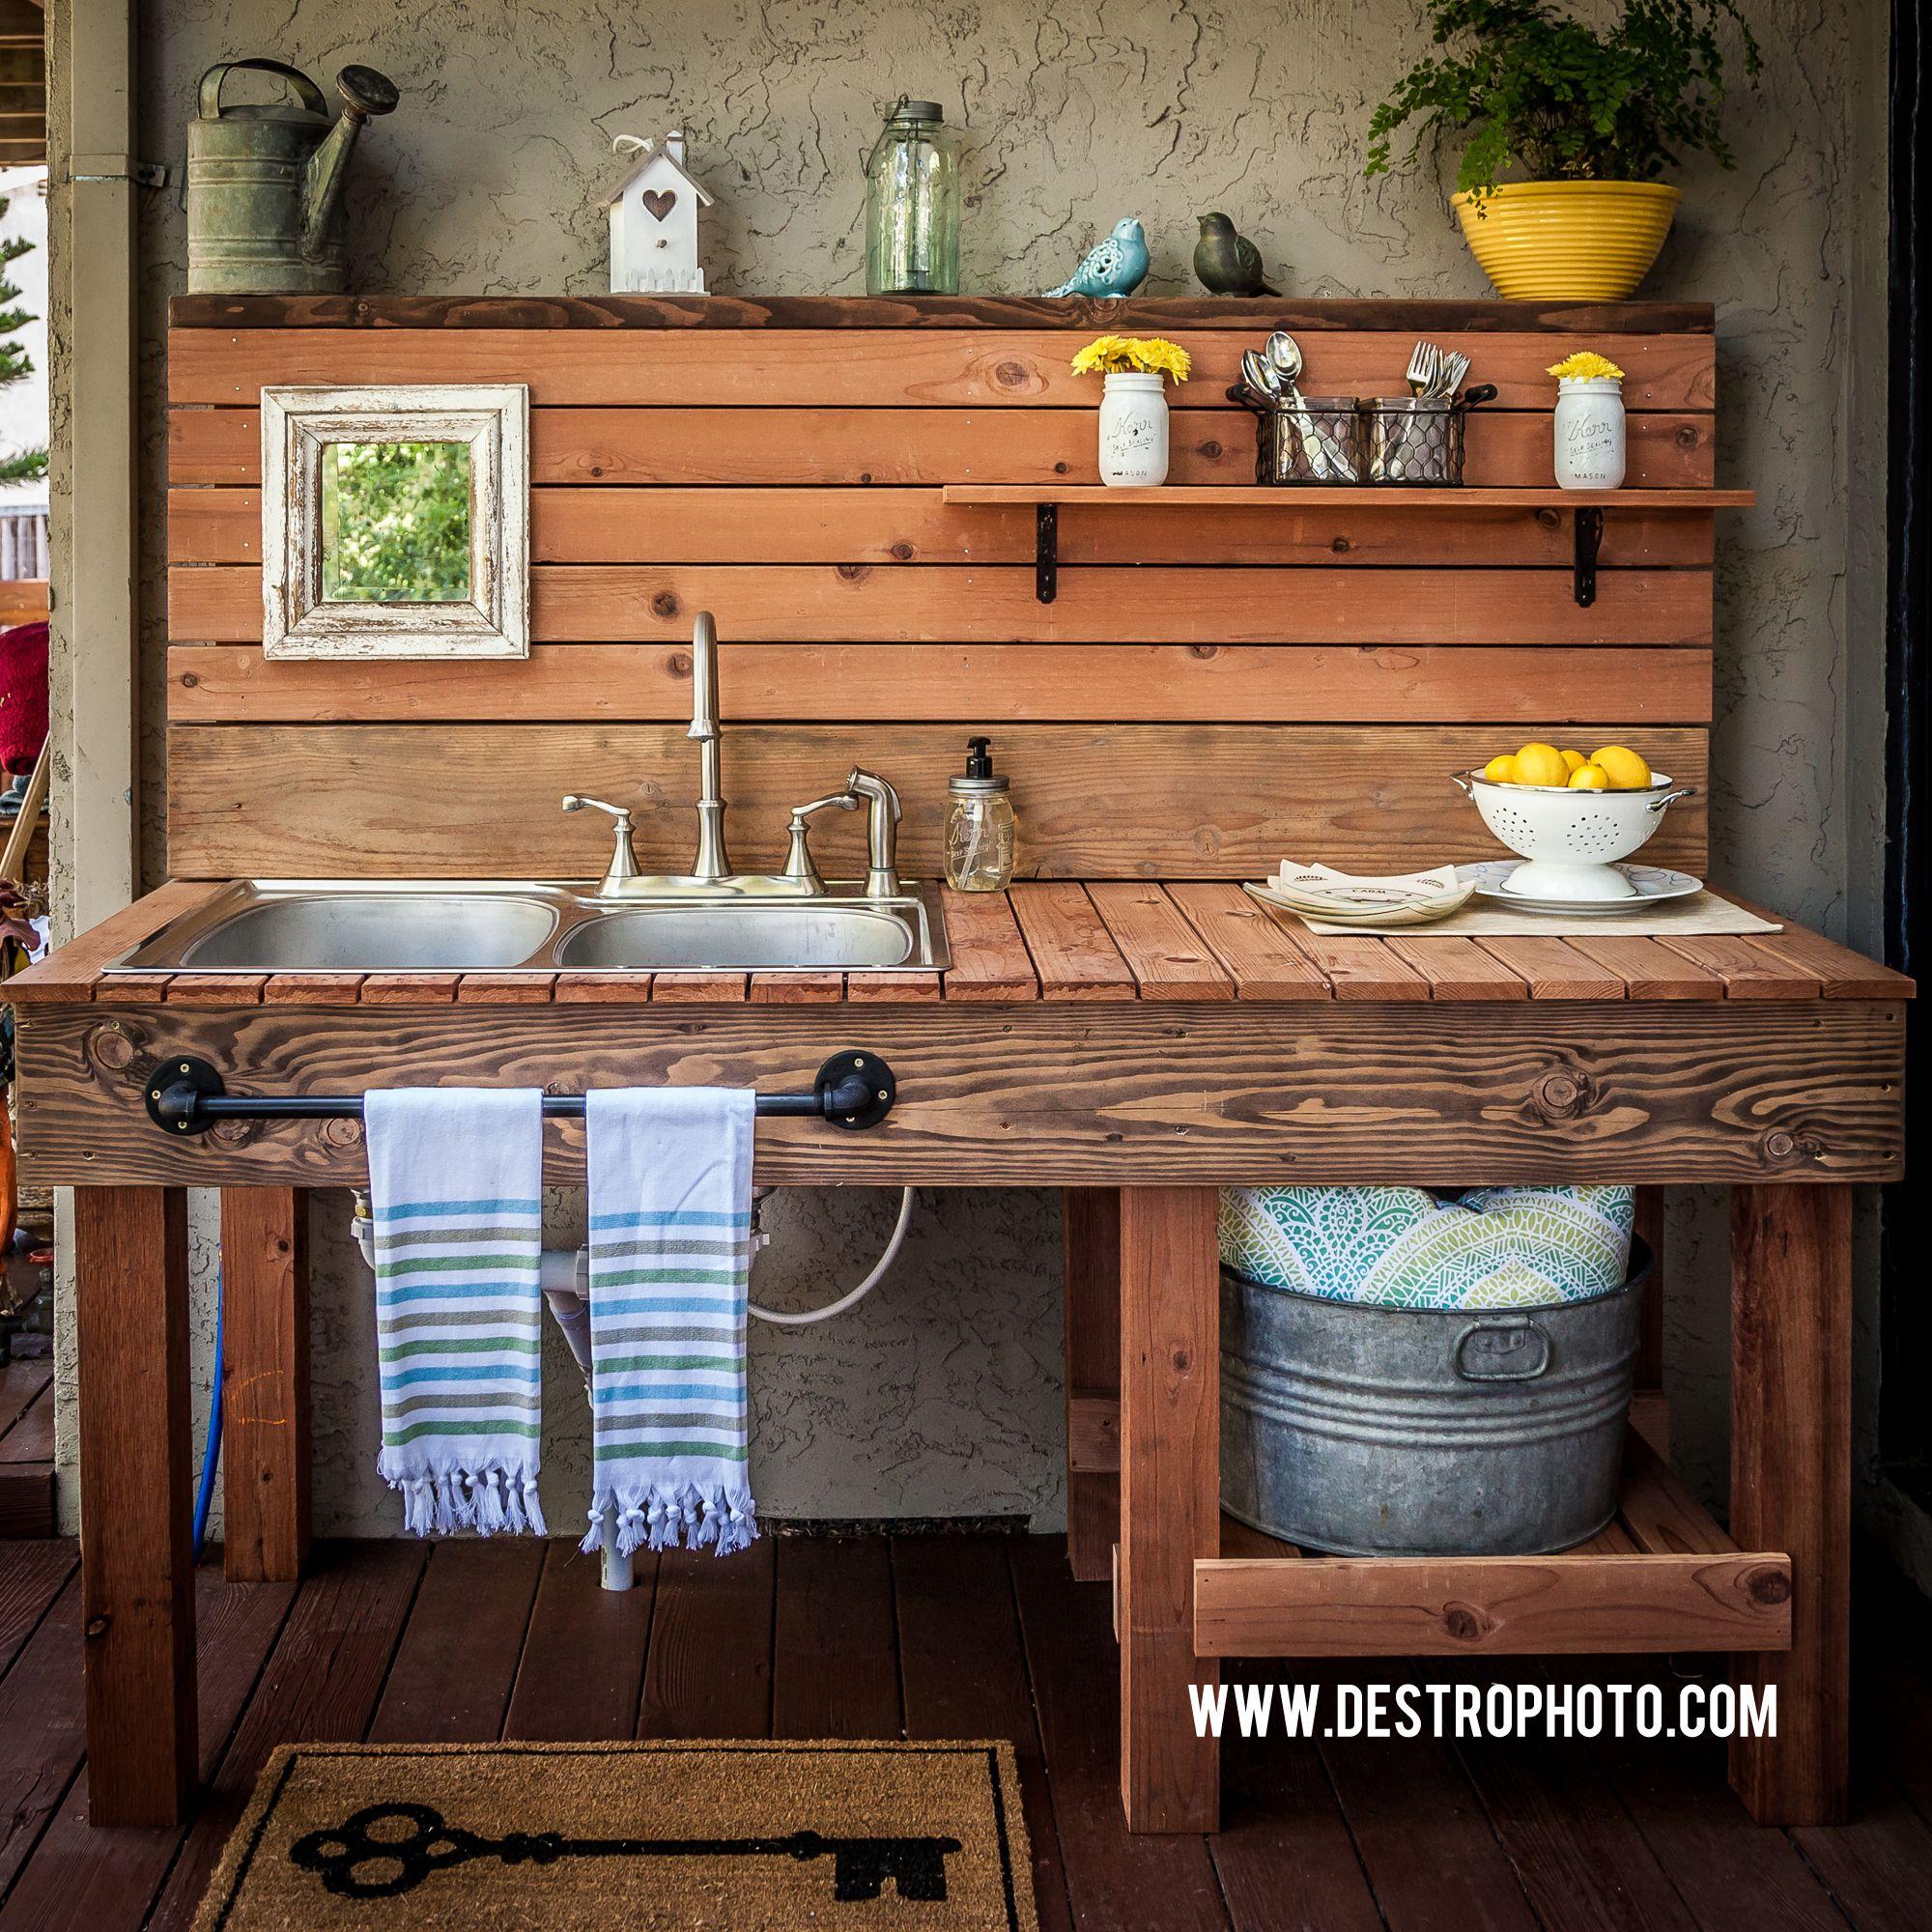 outdoor kitchen sink diy sink mason jars with images outdoor kitchen potting bench plans on kitchen sink ideas id=27592